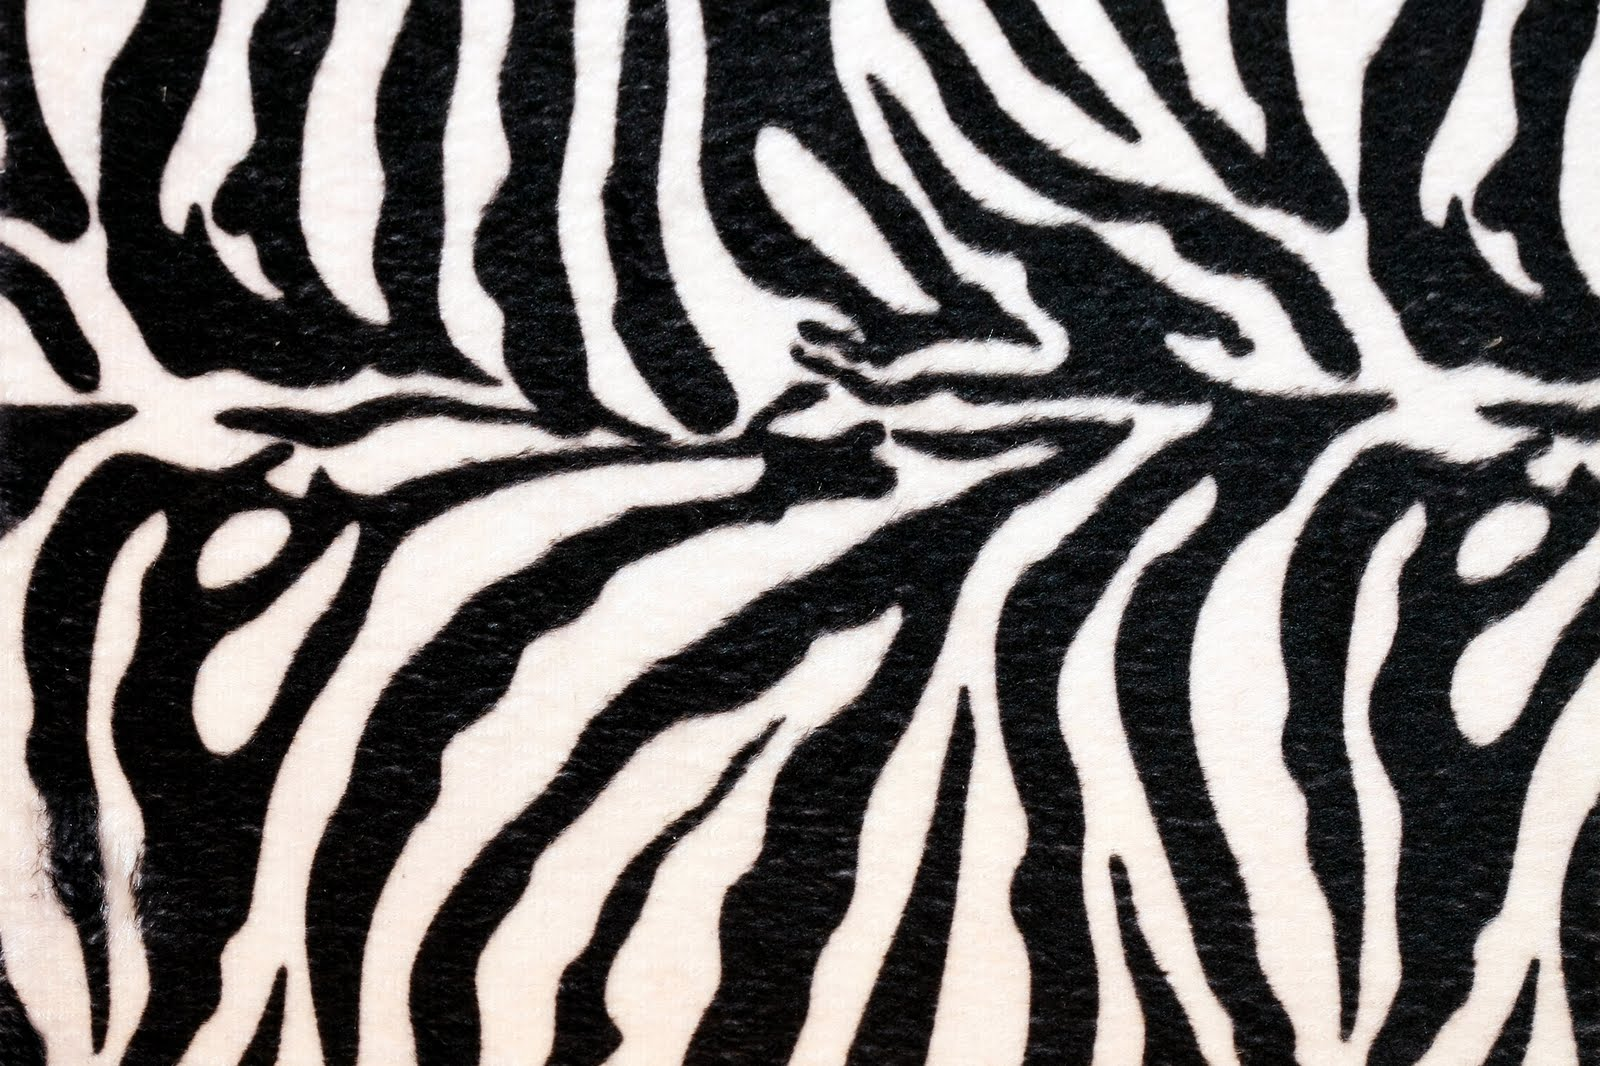 zebra print wallpaper i love zebra print zebra wallpaper pack 3 zebra    Zebra Skin Wallpaper